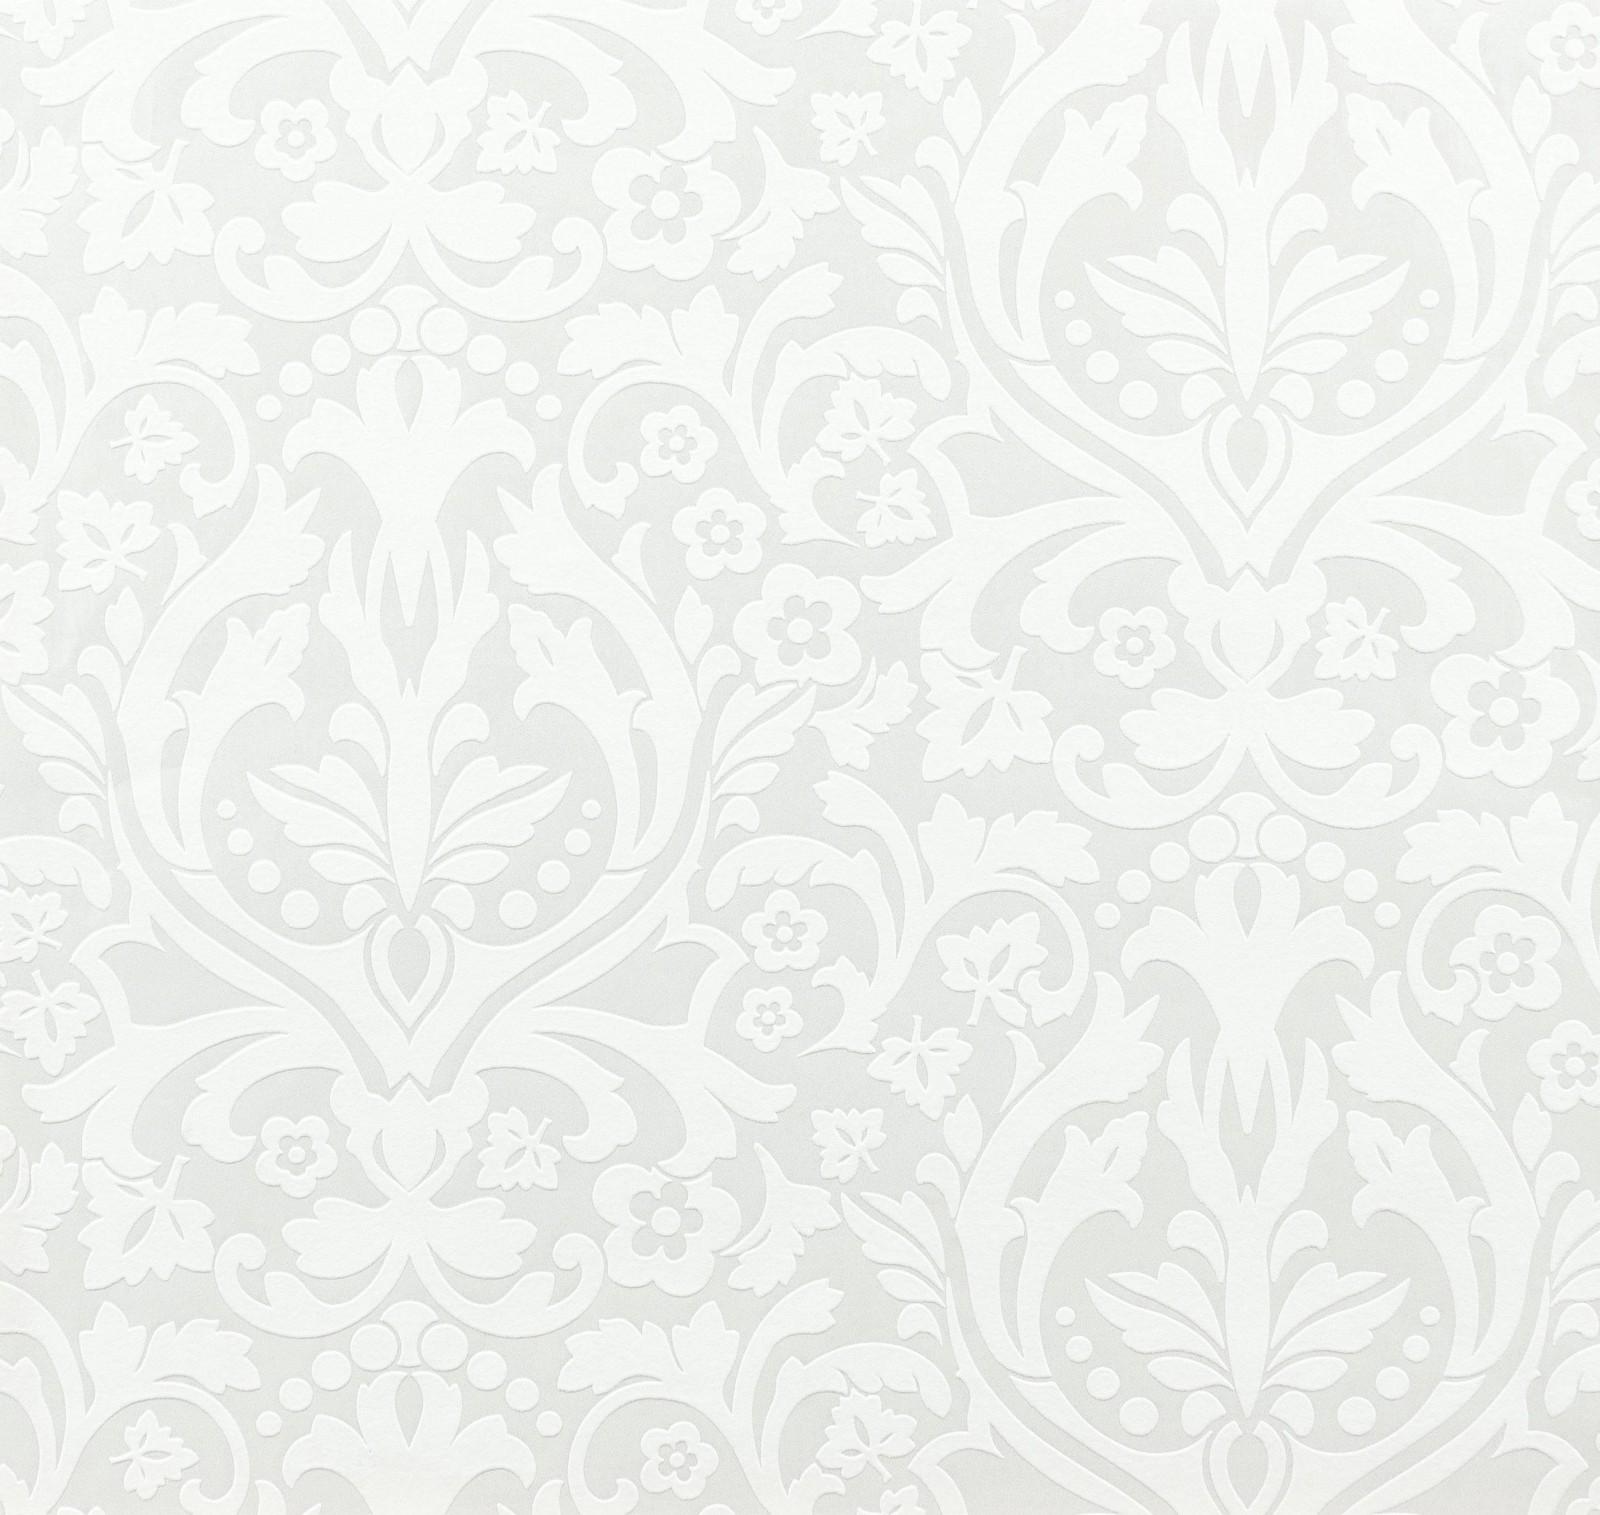 tapete rasch chelsea ornamente 758733 weiss silber